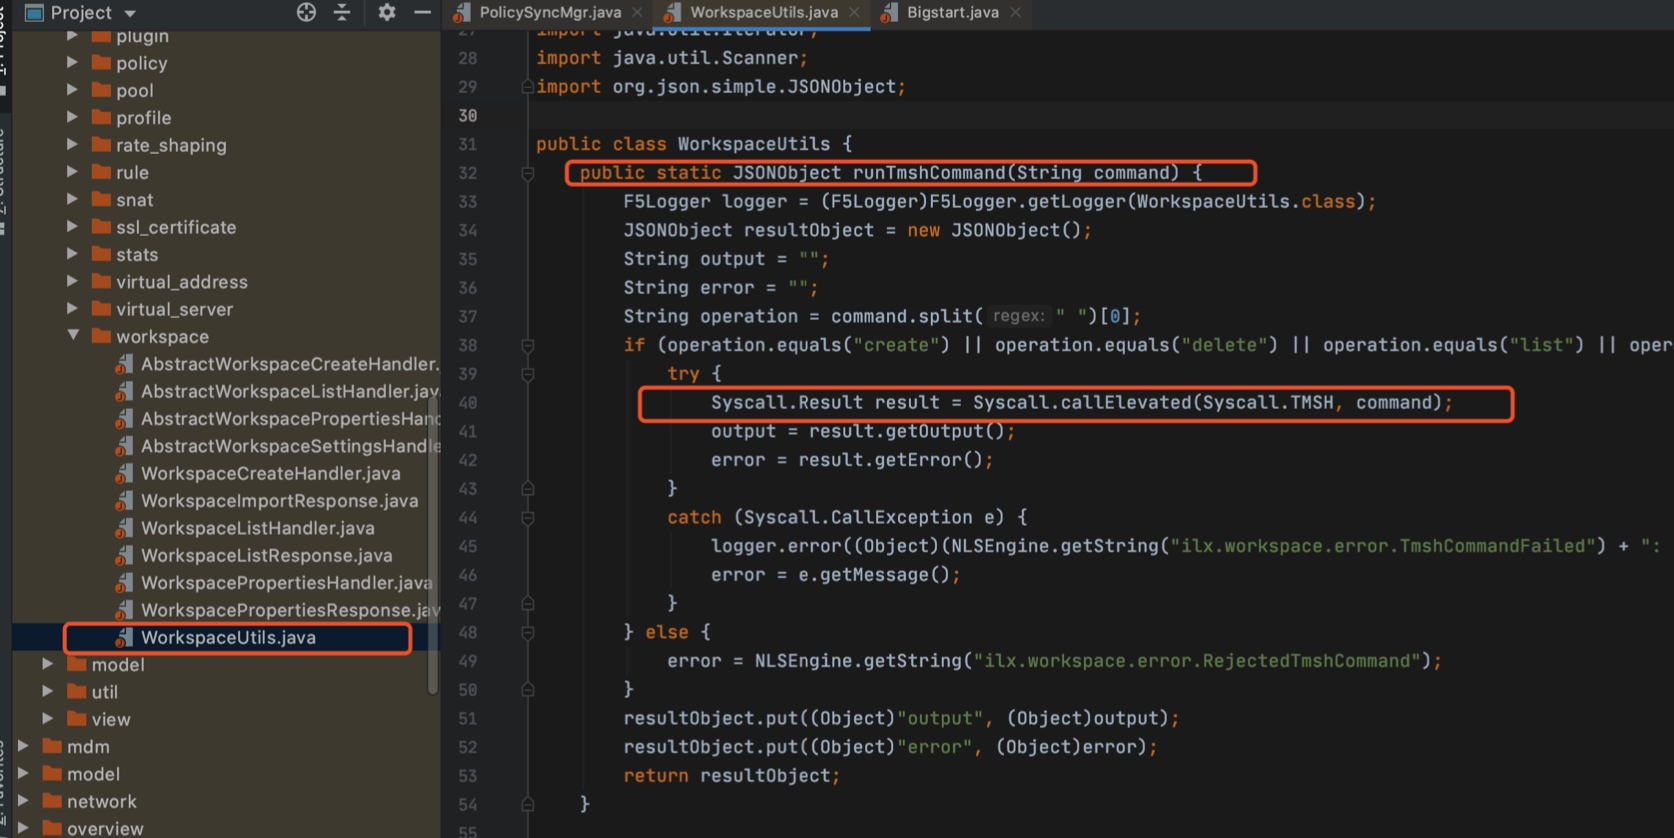 F5远程代码执行漏洞分析